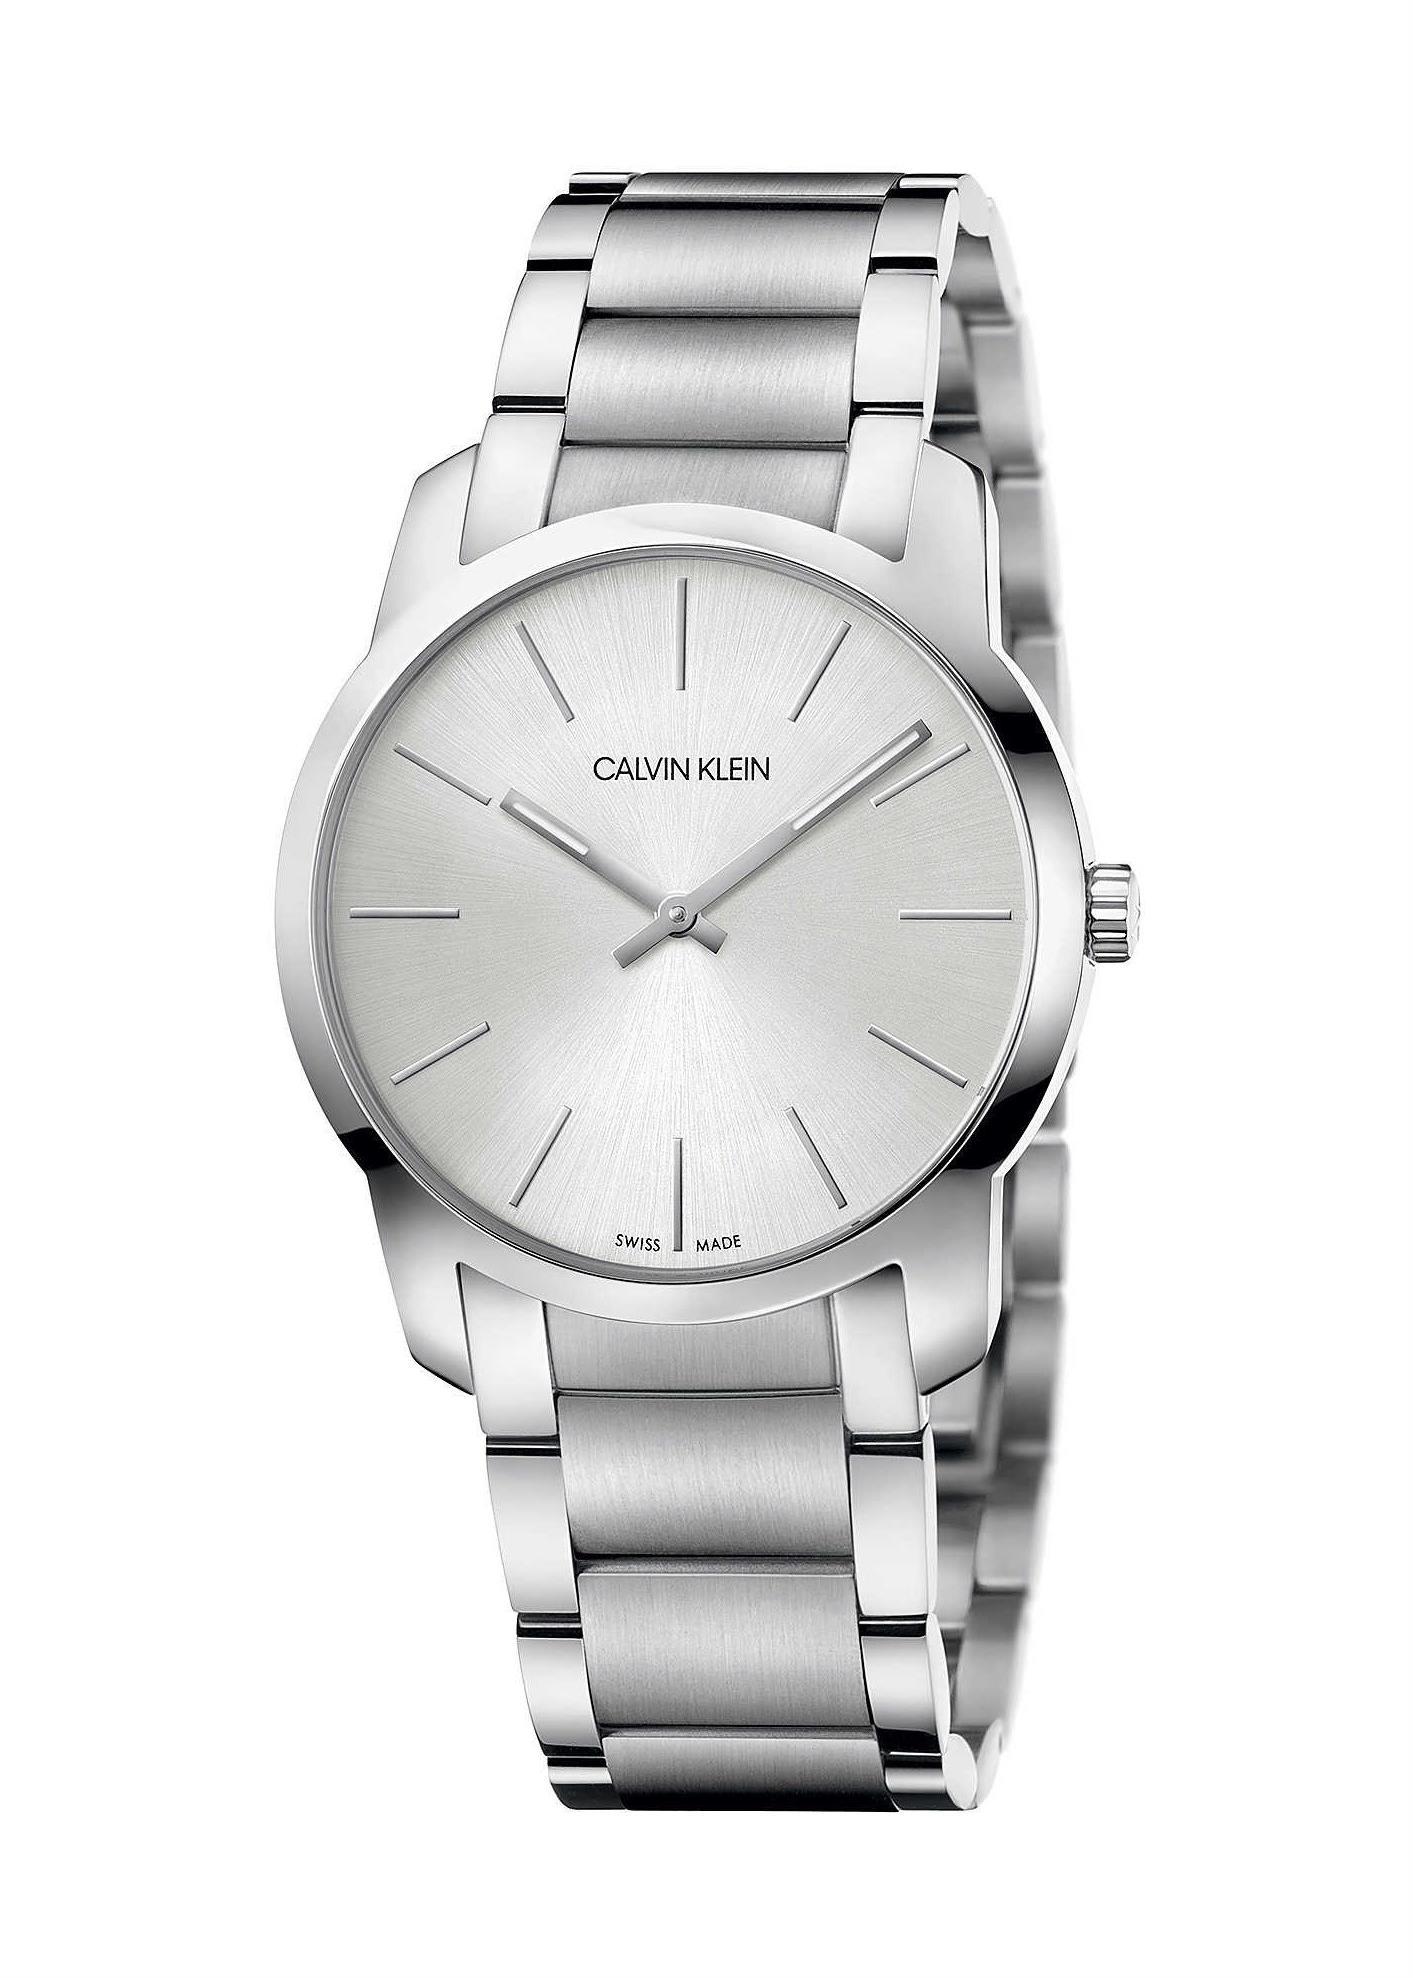 CK CALVIN KLEIN Unisex Wrist Watch Model CITY EXTENSION K2G22146